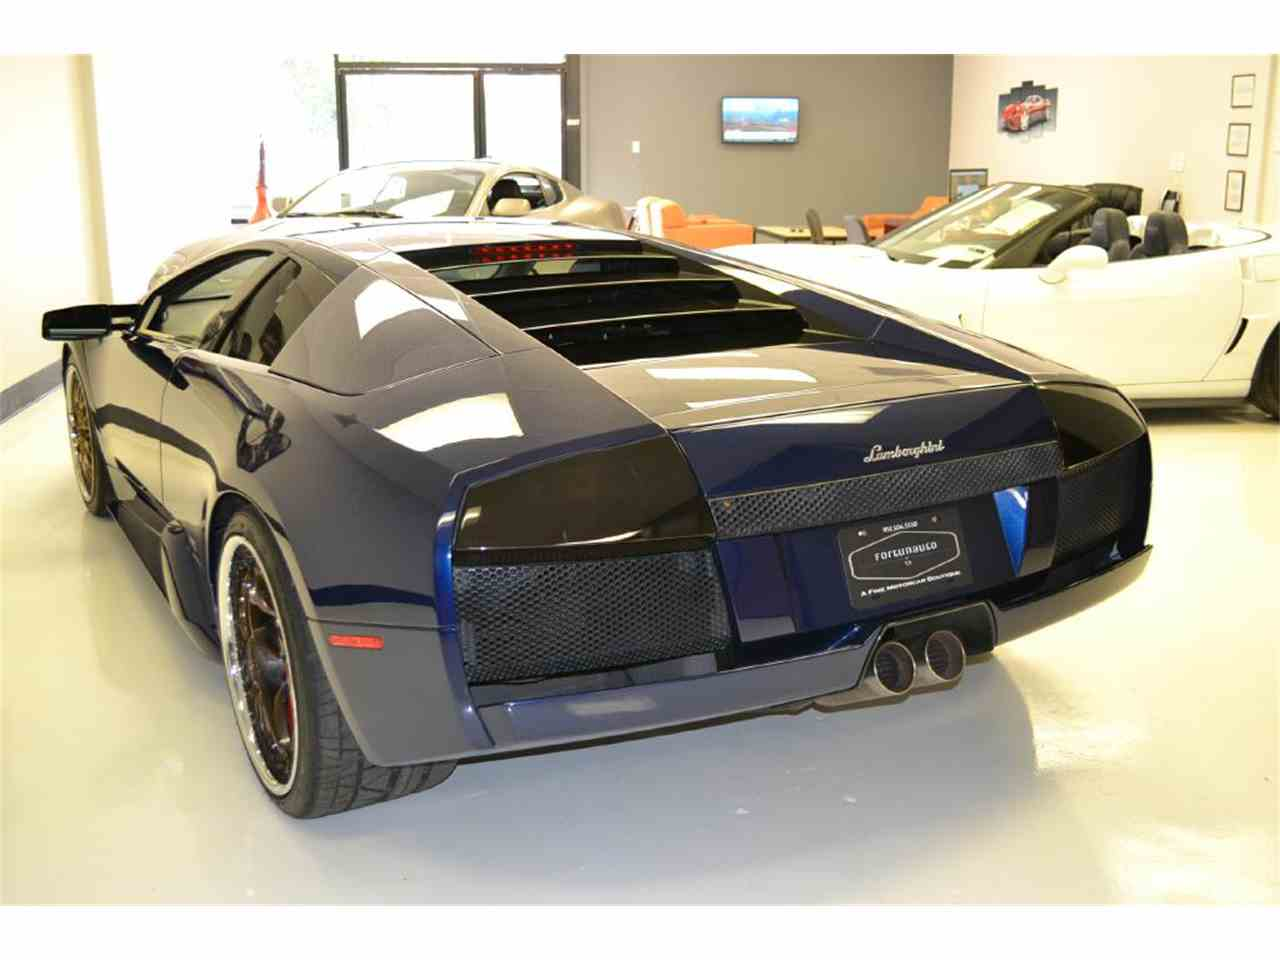 Large Picture of 2004 Lamborghini Murcielago located in Temecula California - $110,000.00 Offered by Fortunauto 13 LLC - LVJ1